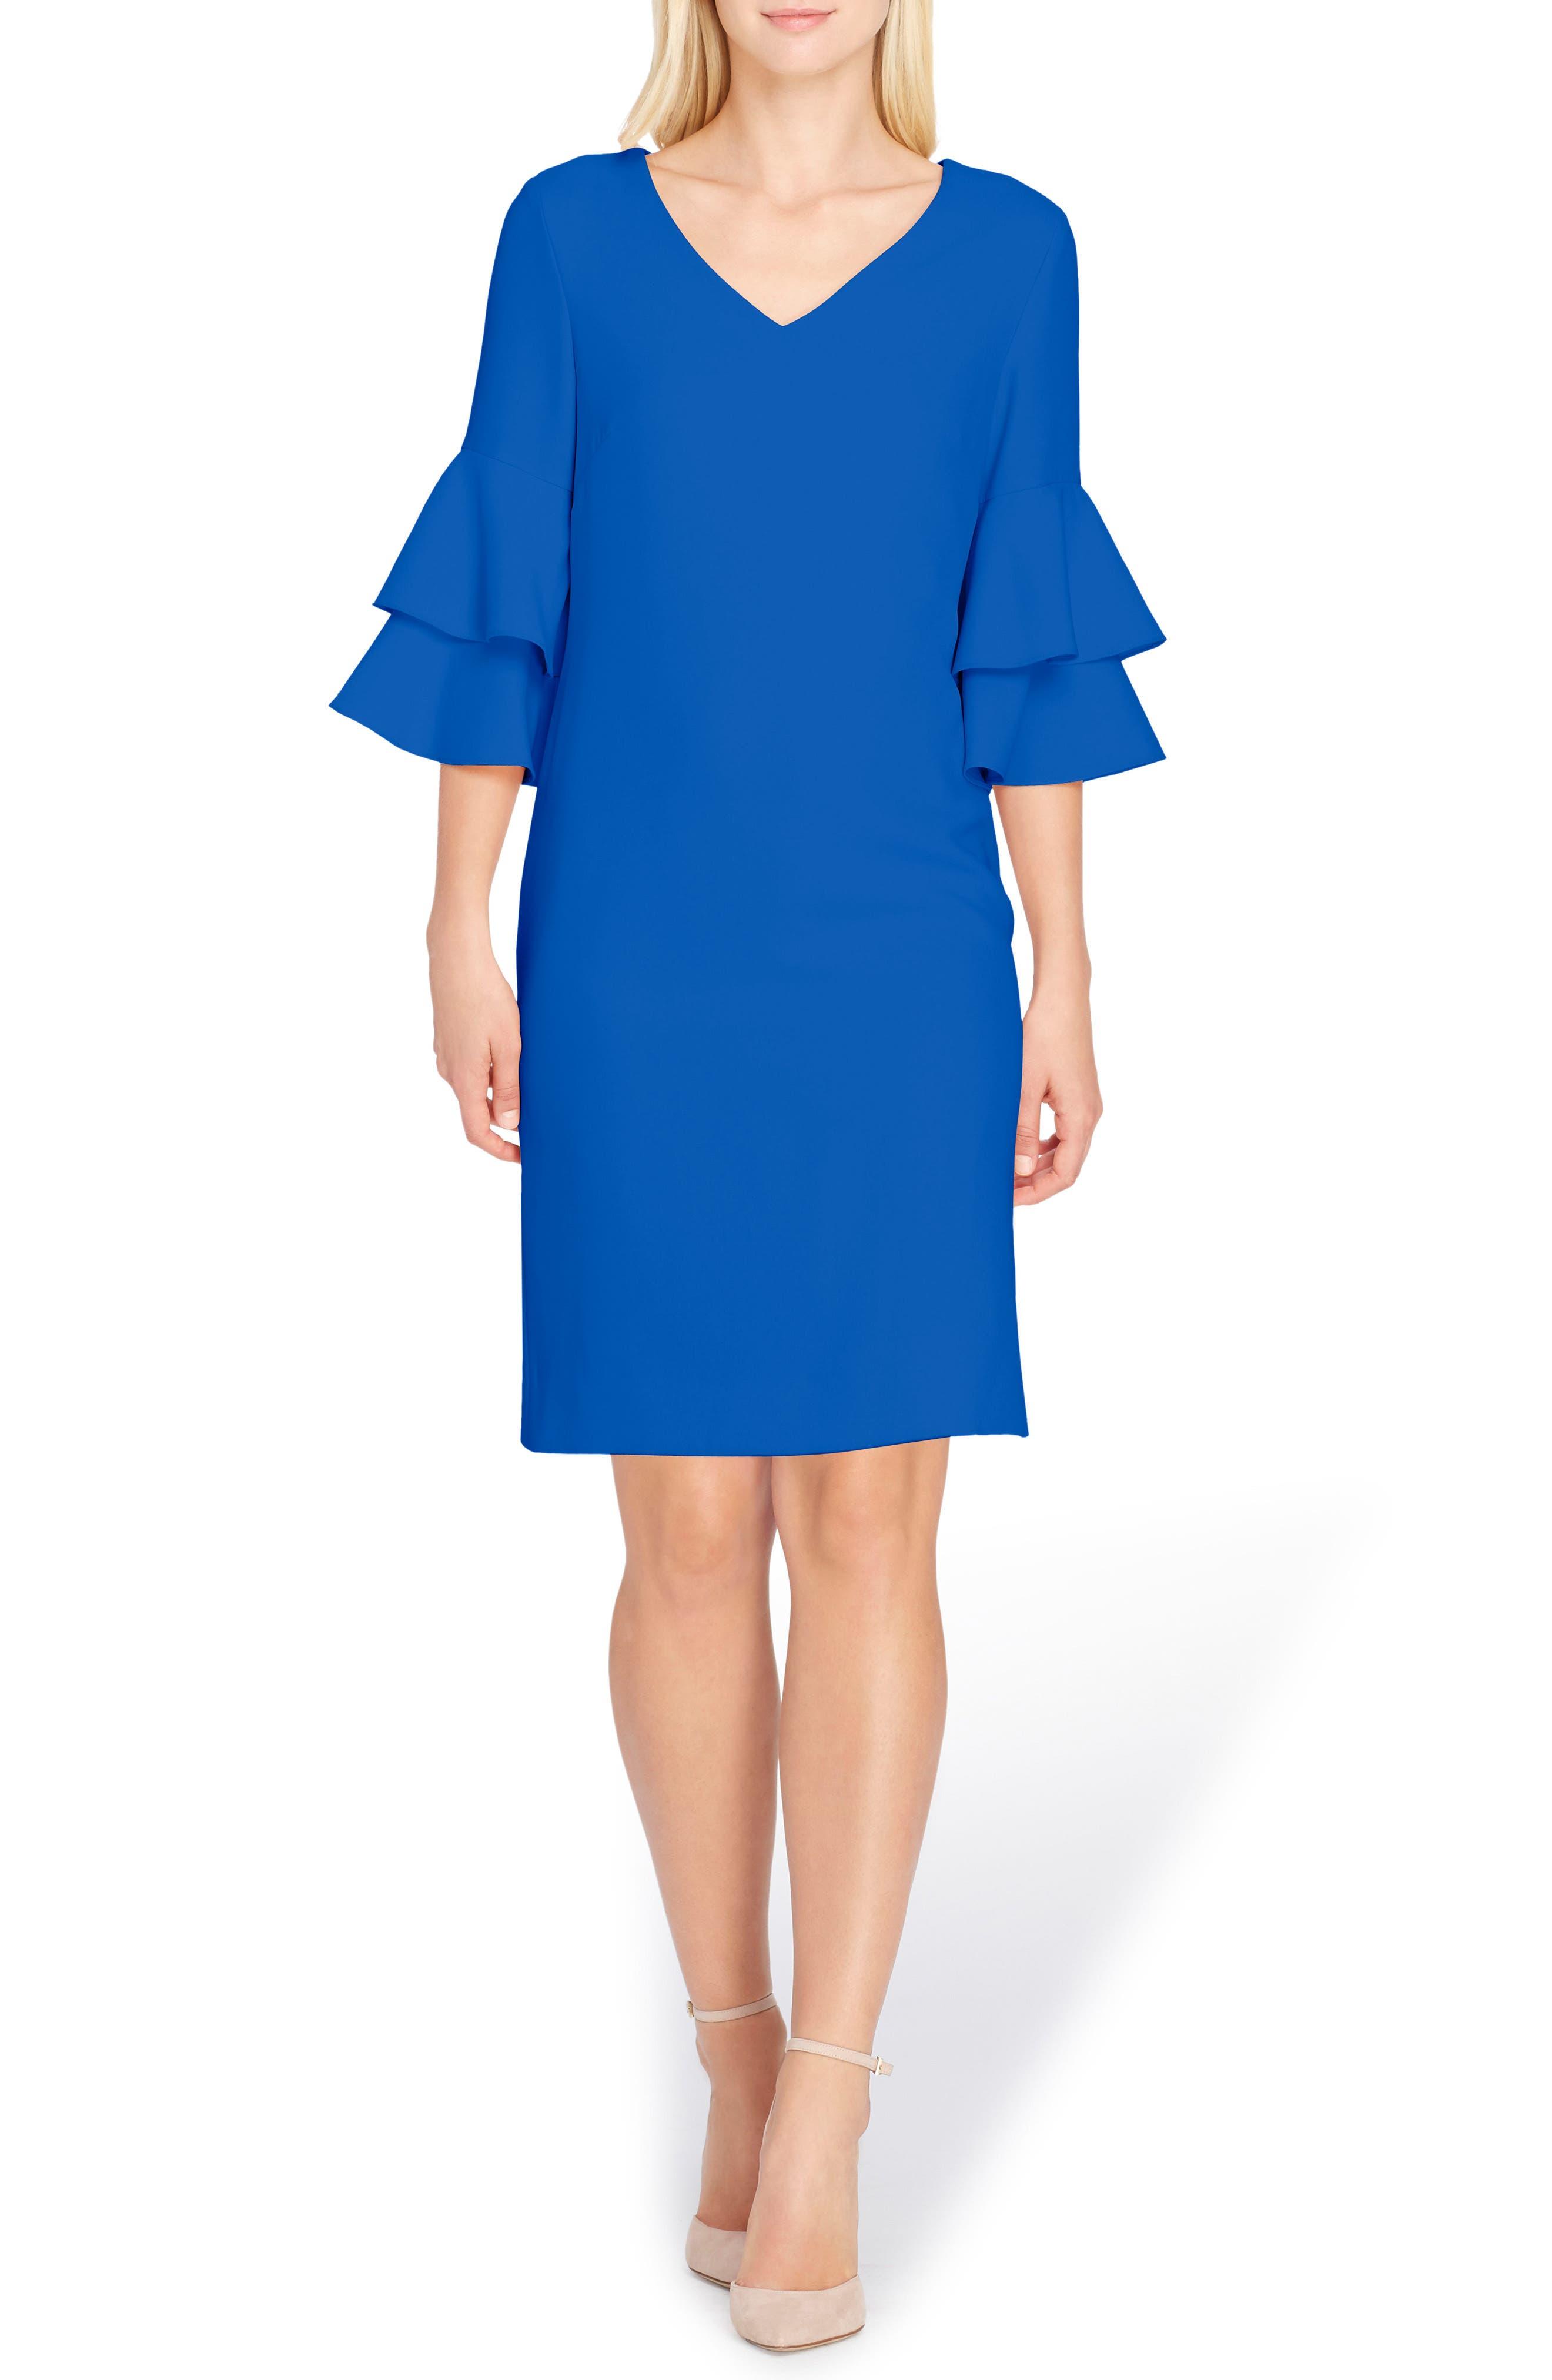 Tahari Ruffle Sleeve Shift Dress